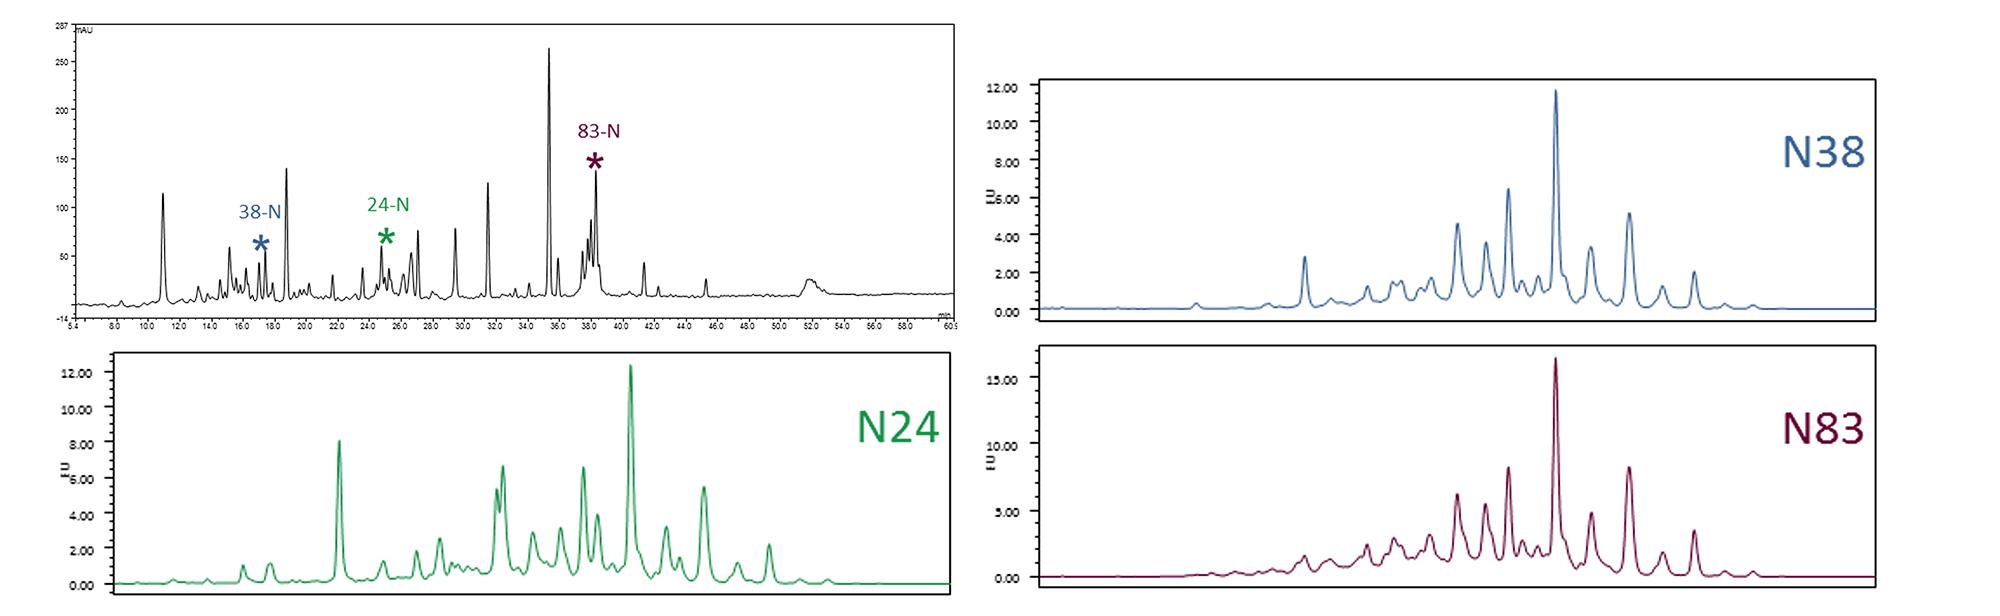 Site specific glycosylation analysis image